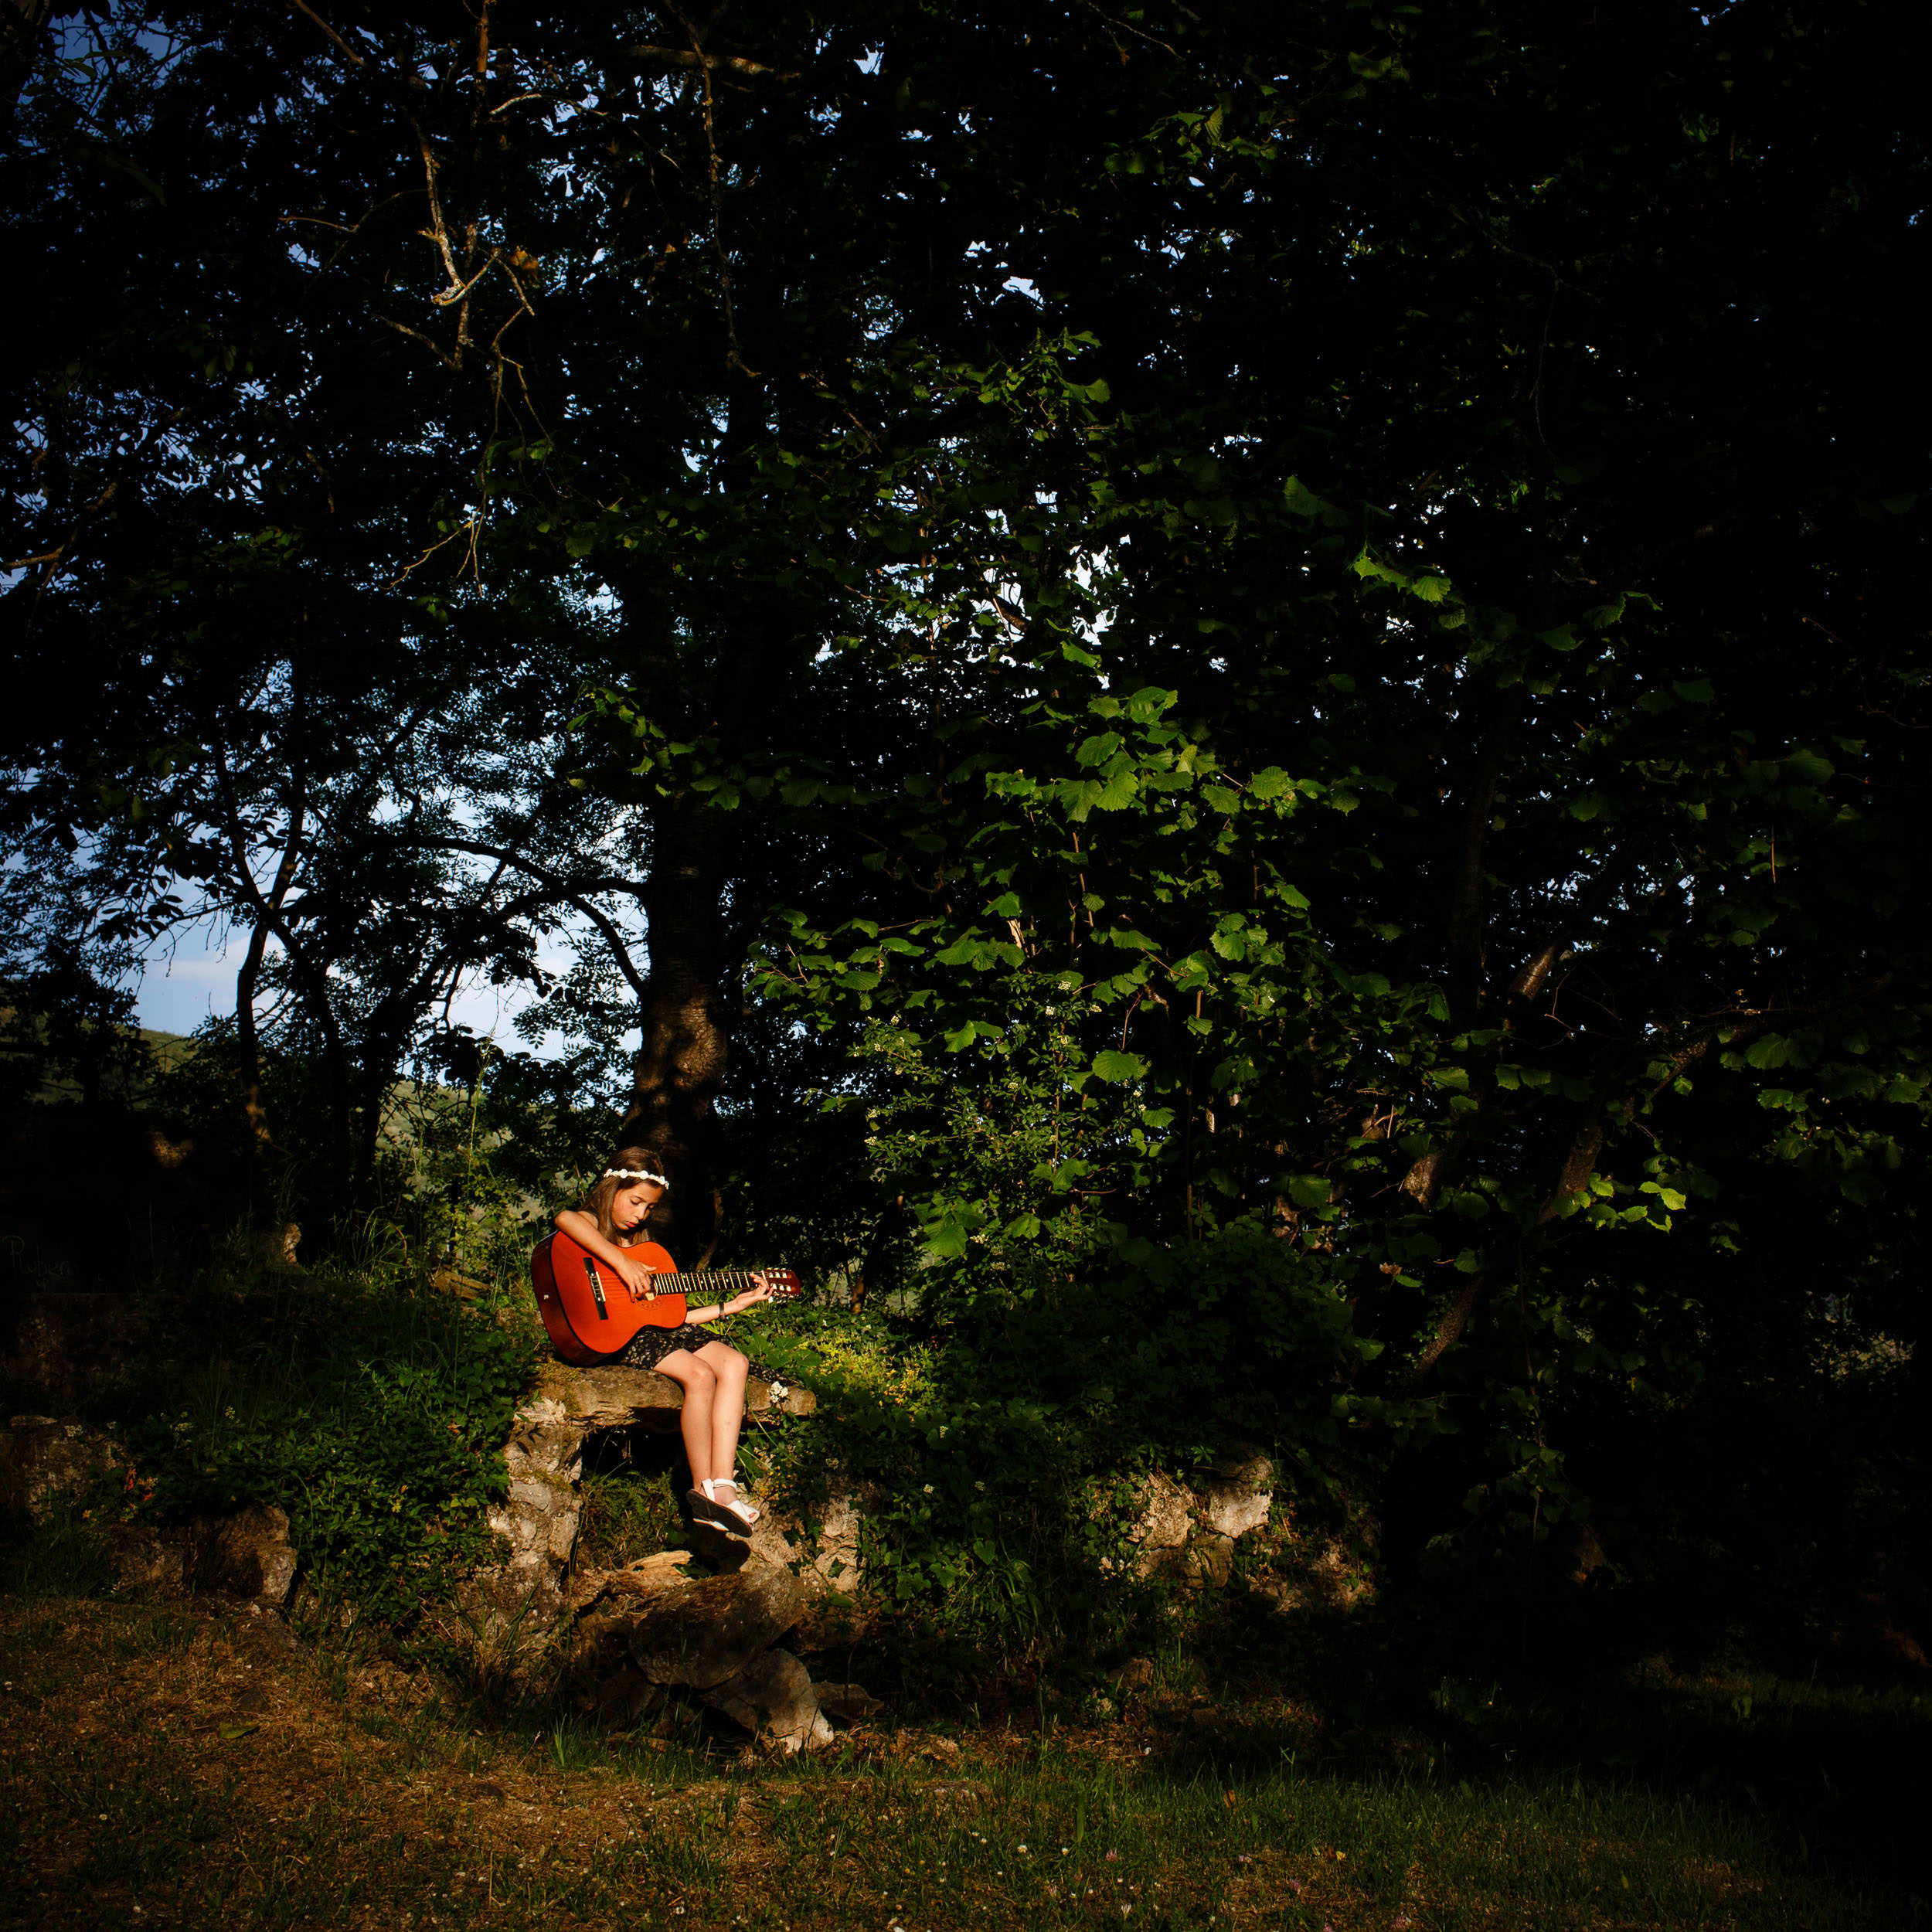 Portrait Photography in La Rioja Basque Country Spain - James Sturcke - sturcke.org_006.jpg